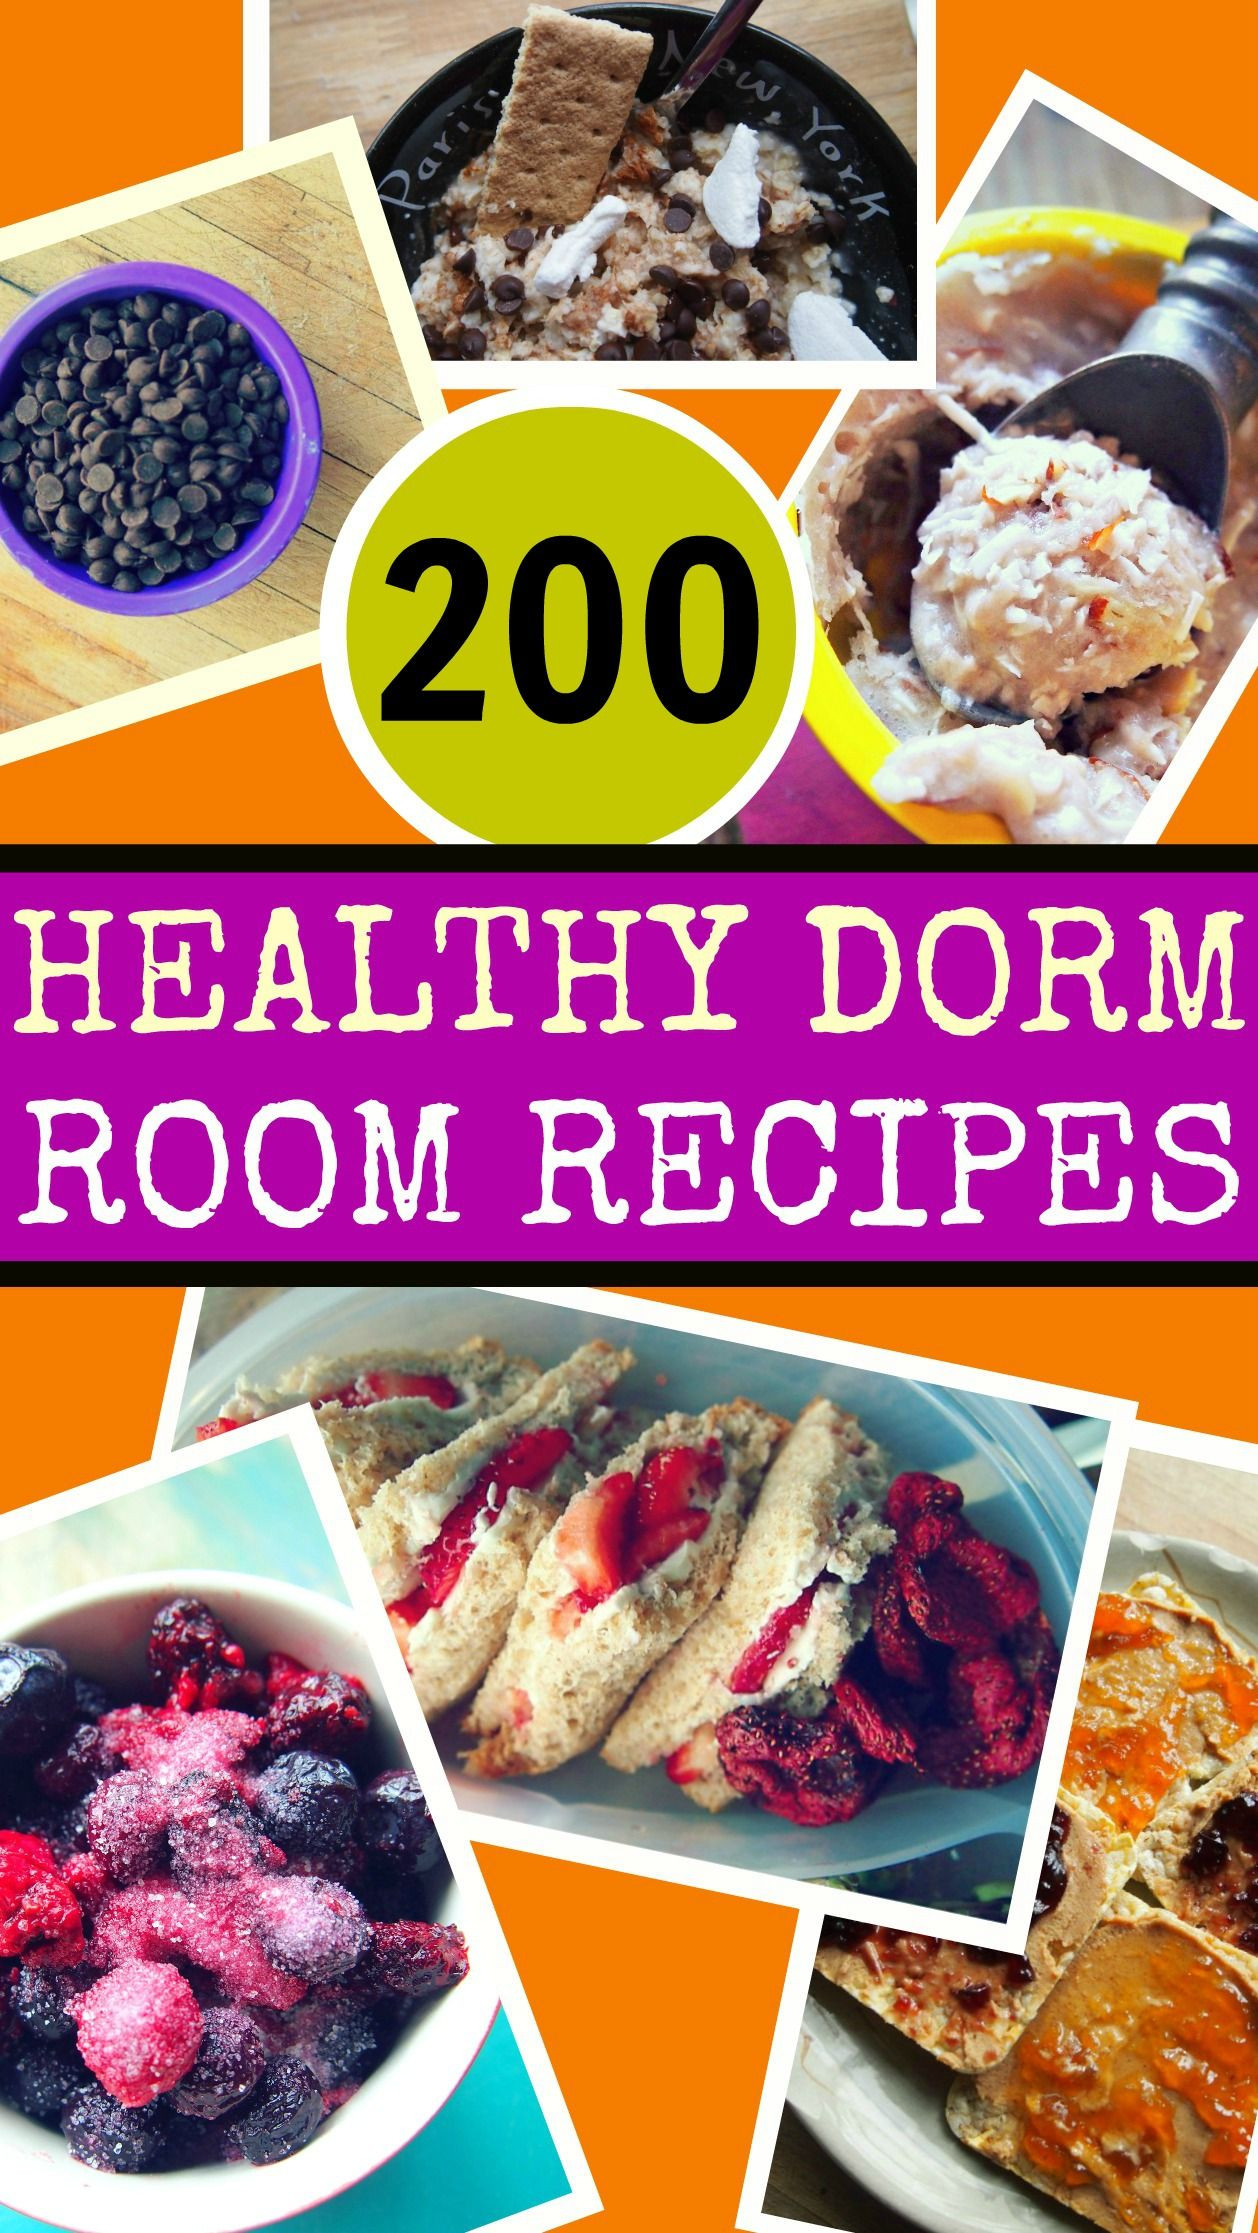 Healthy Snacks For College Students  200 Healthy Dorm Room Recipes by Taralynn McNitt I don t